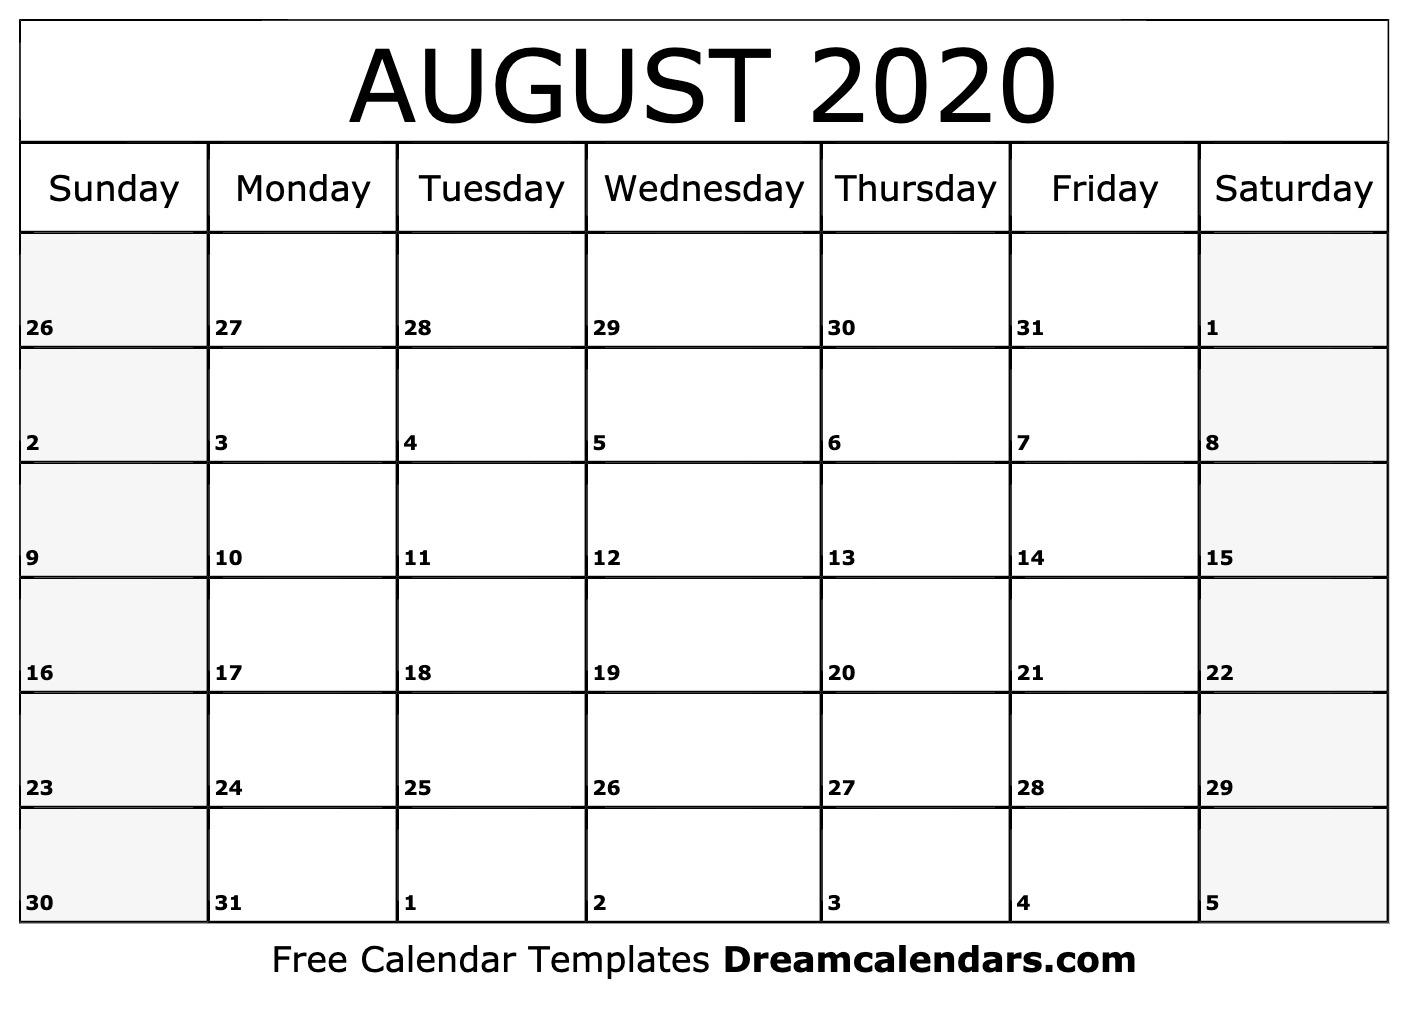 Pretty Blank Augst Calender 2020 | Free Calendar Template with Blank Calendar Pretty